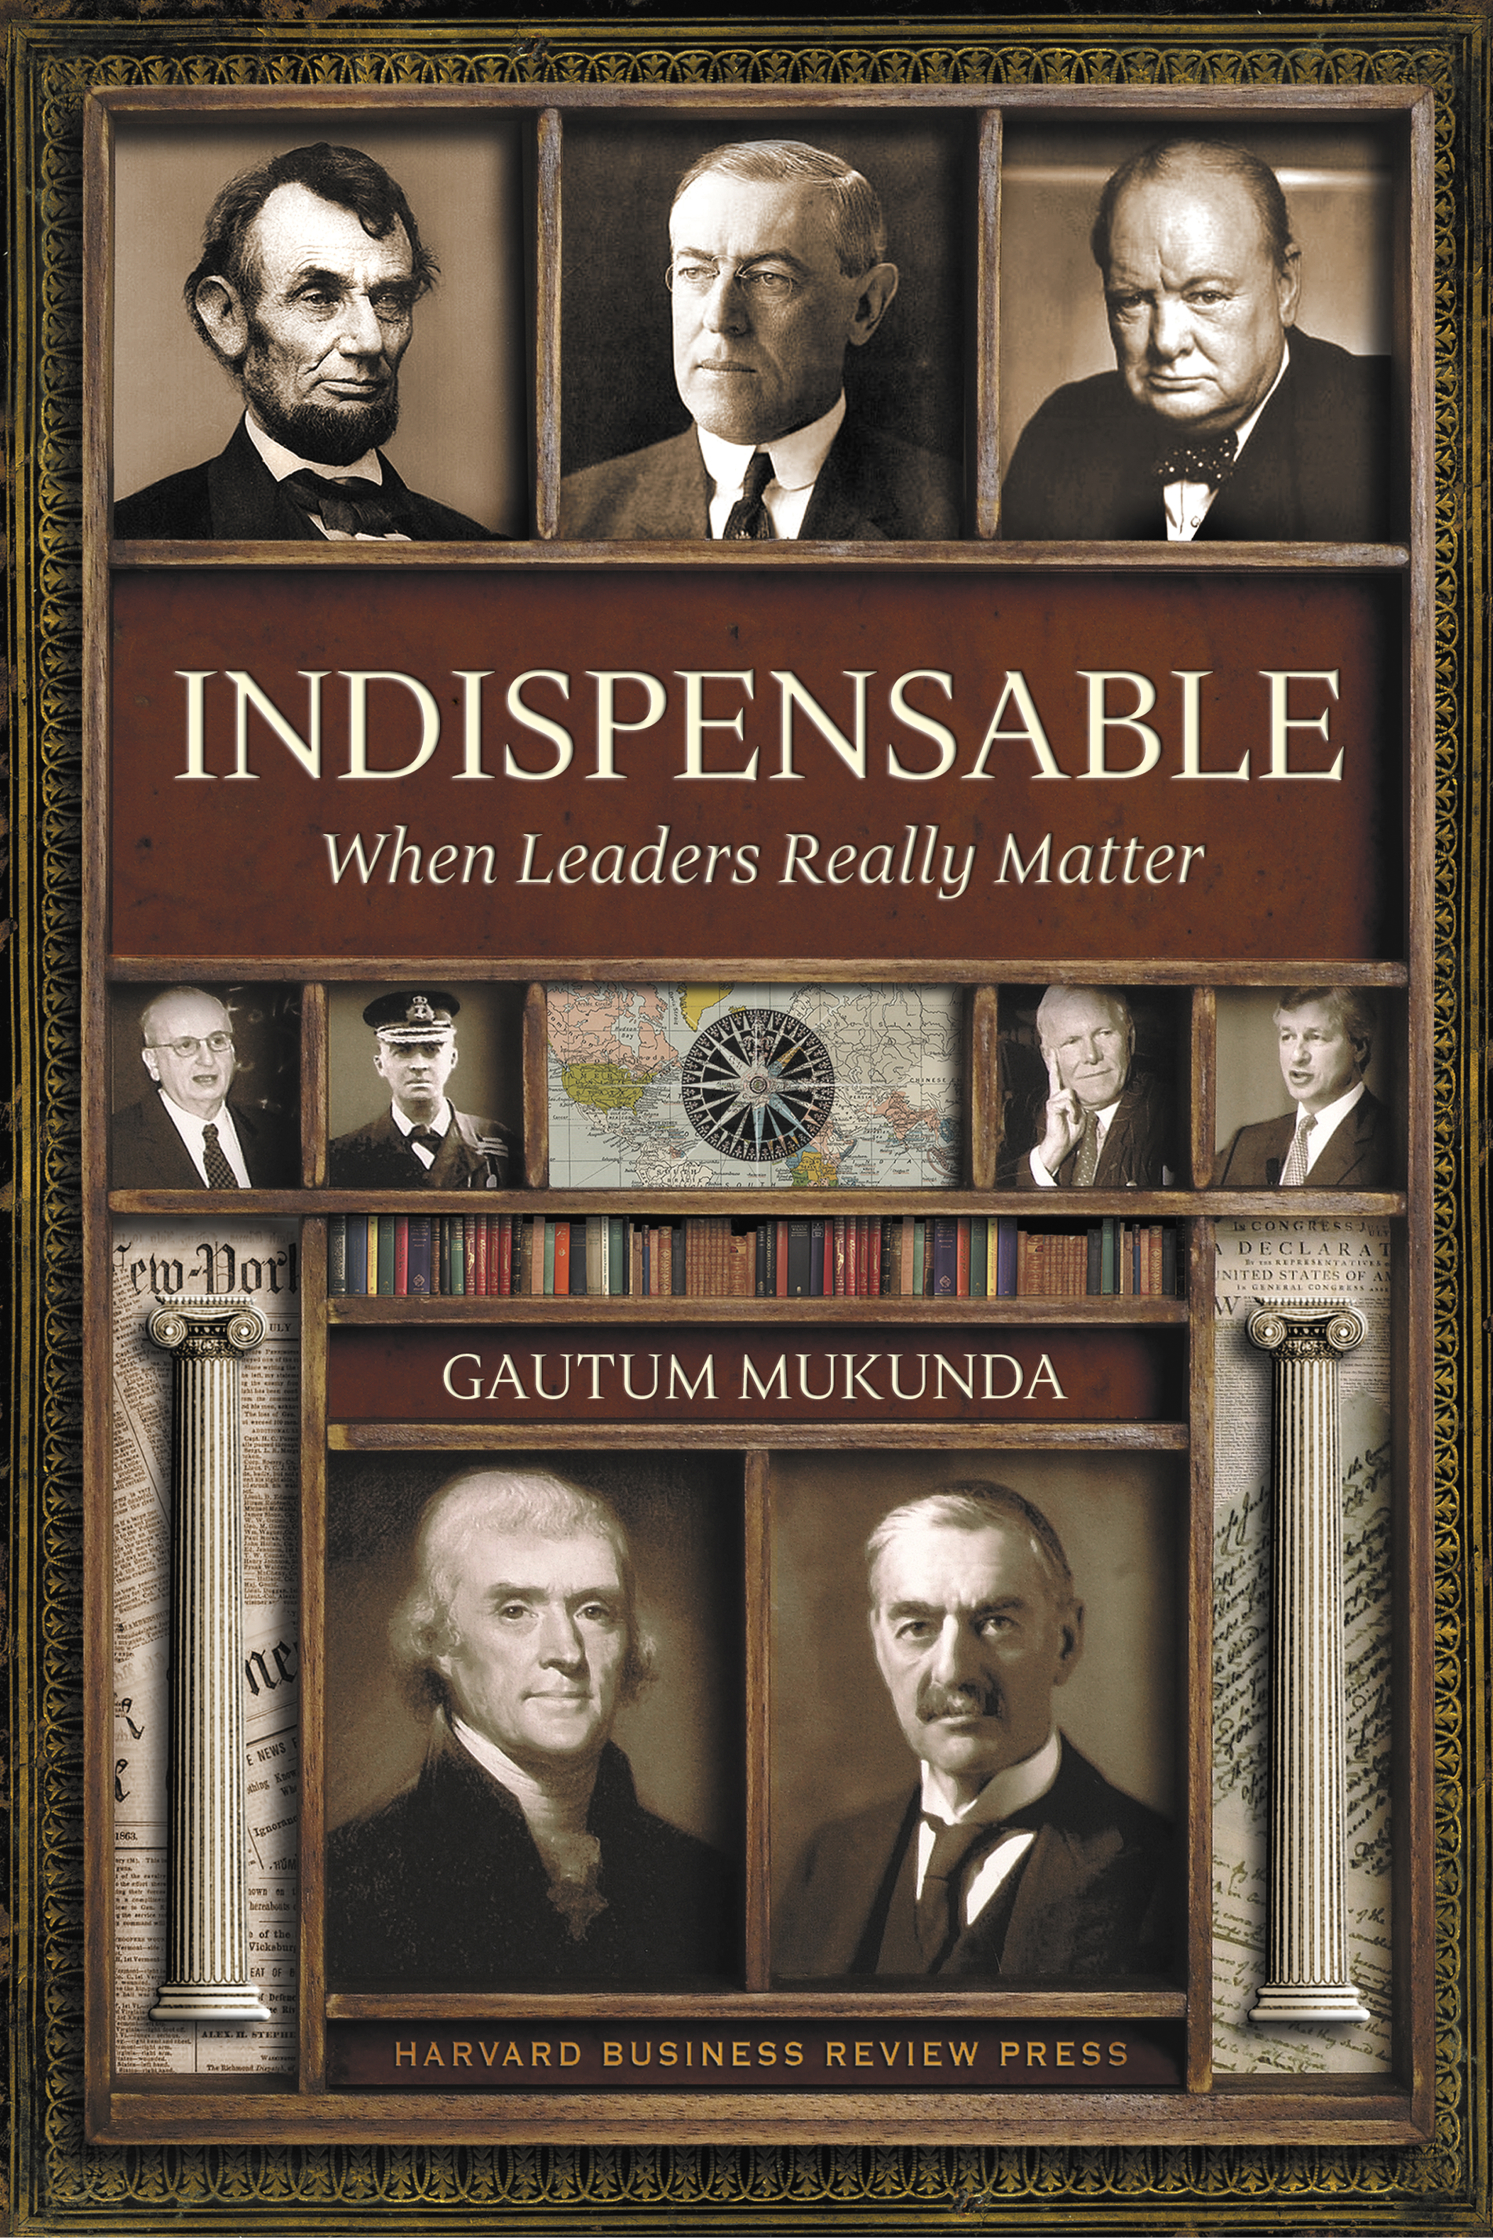 Indispensable Political Leadership / Harvard Press